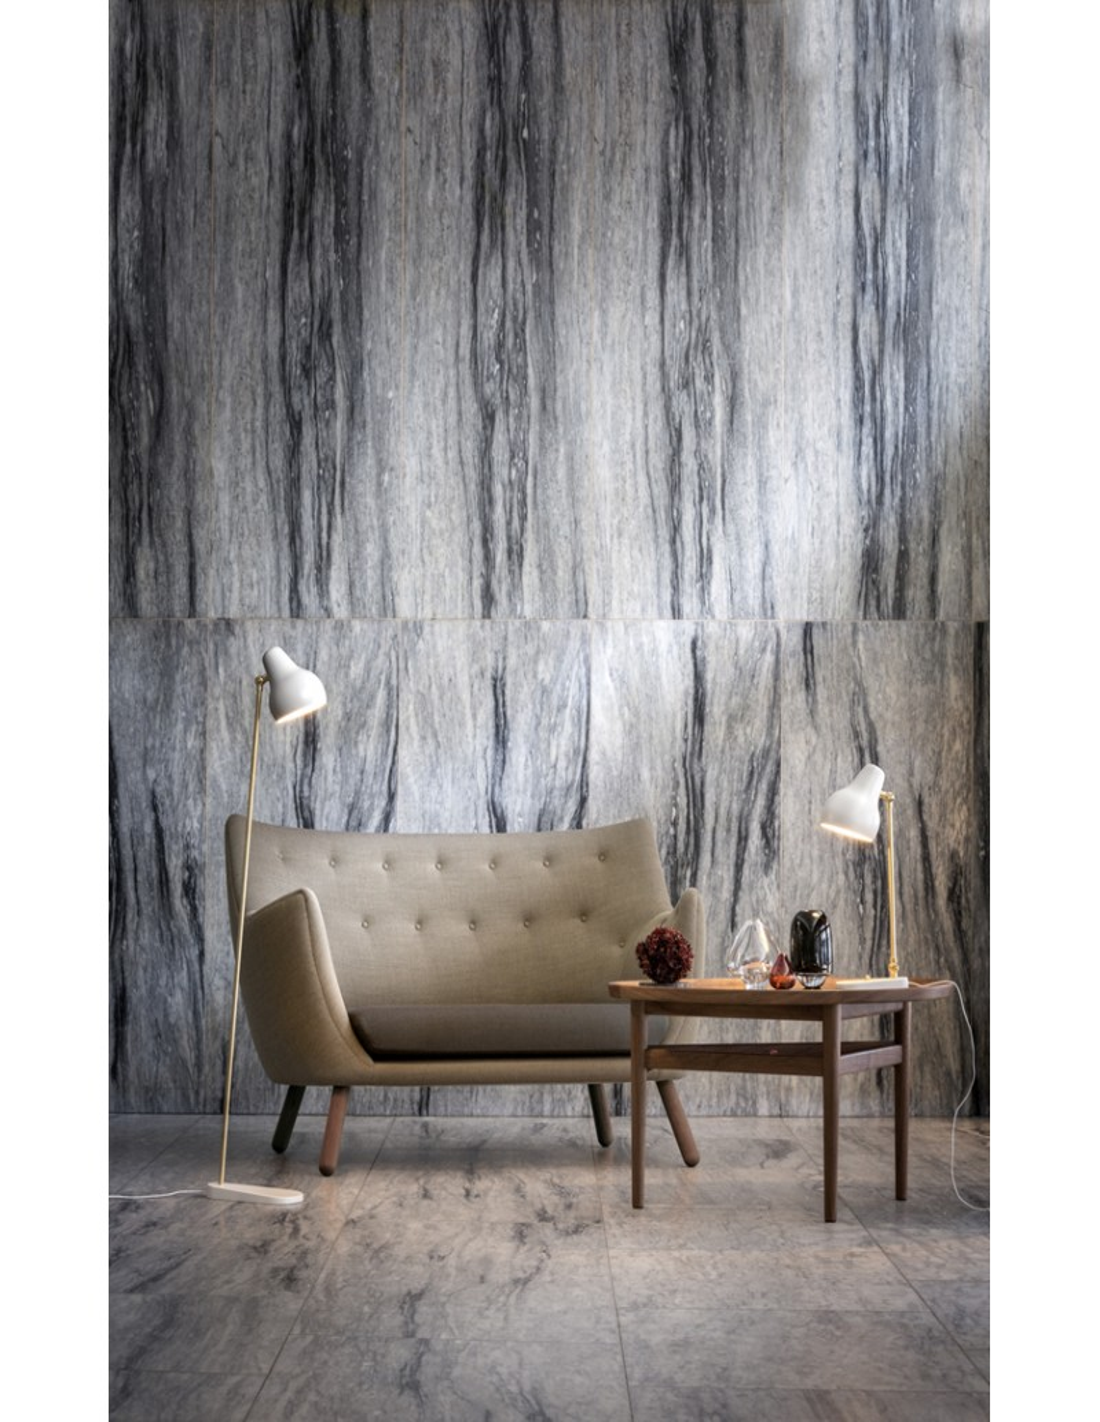 Vl38 Wall Light Design Vilhelm Lauritzen For Louis Poulsen